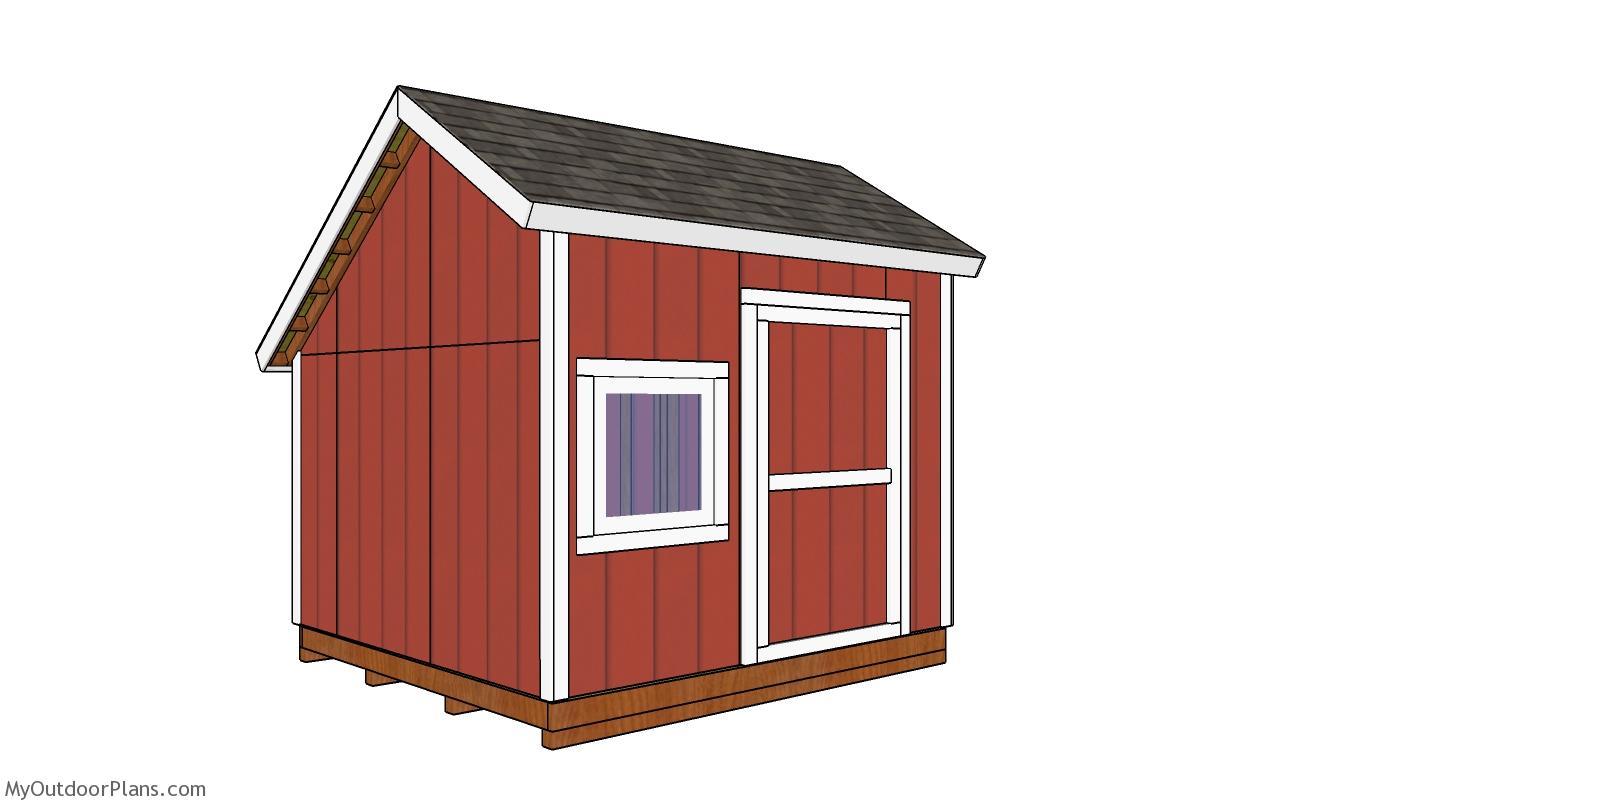 10x10 Saltbox Shed - Free DIY Plans